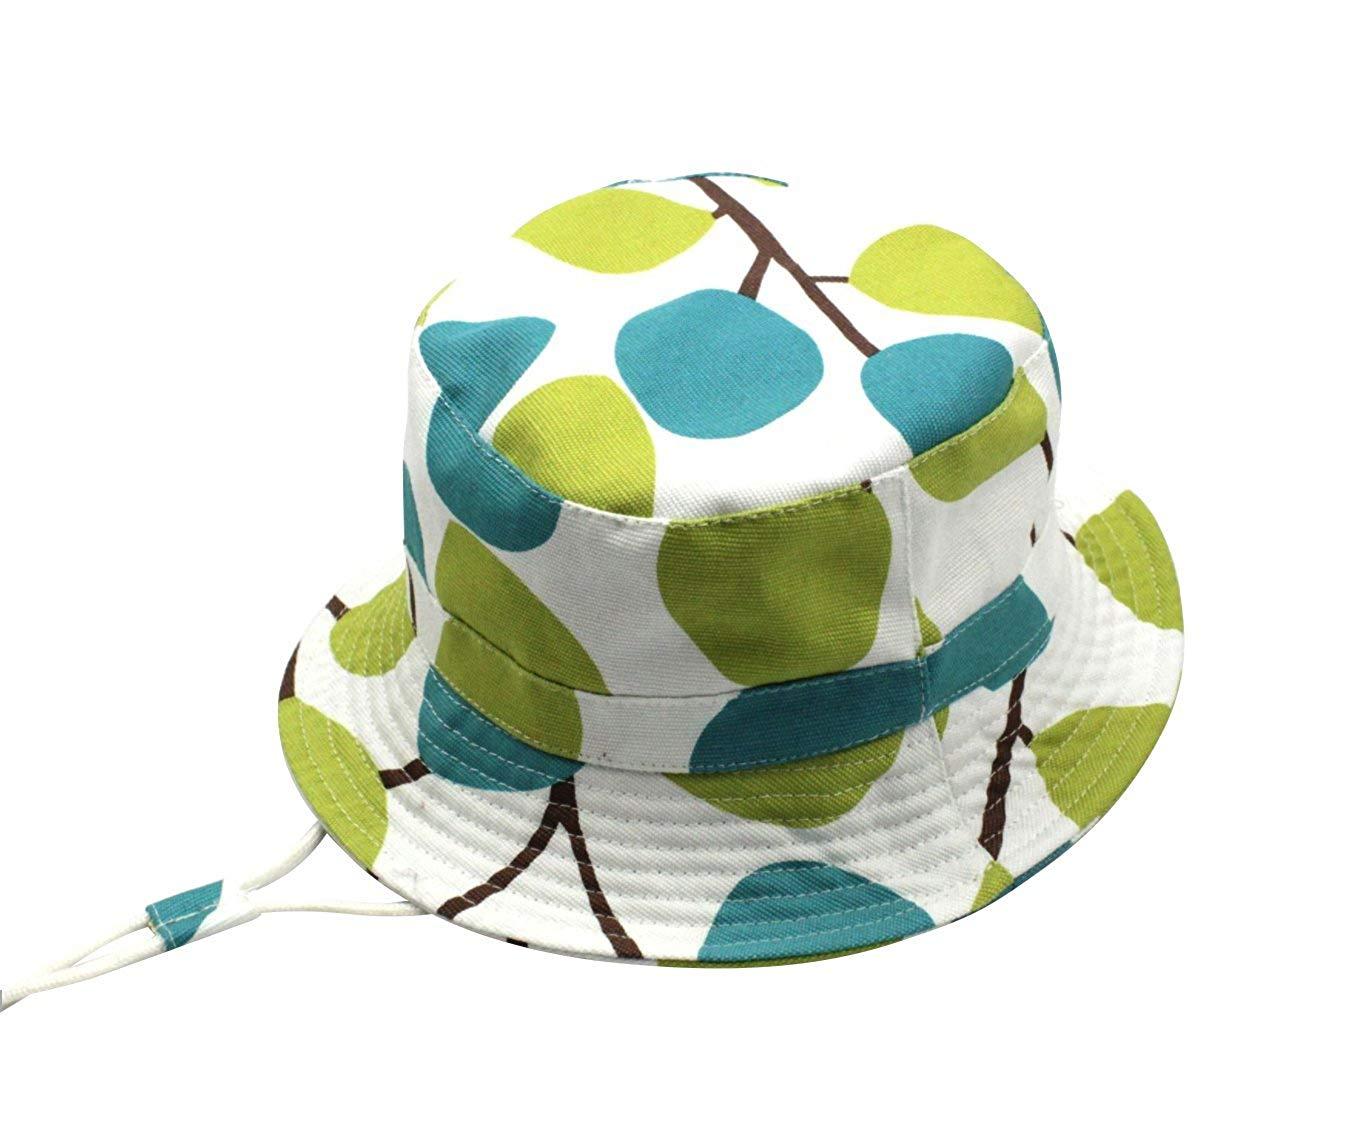 dbdf1d28248e2 Get Quotations · Home Prefer Baby Toddler Kids UPF 50+ Sun Protection Hat  Safari Bucket Sun Hat